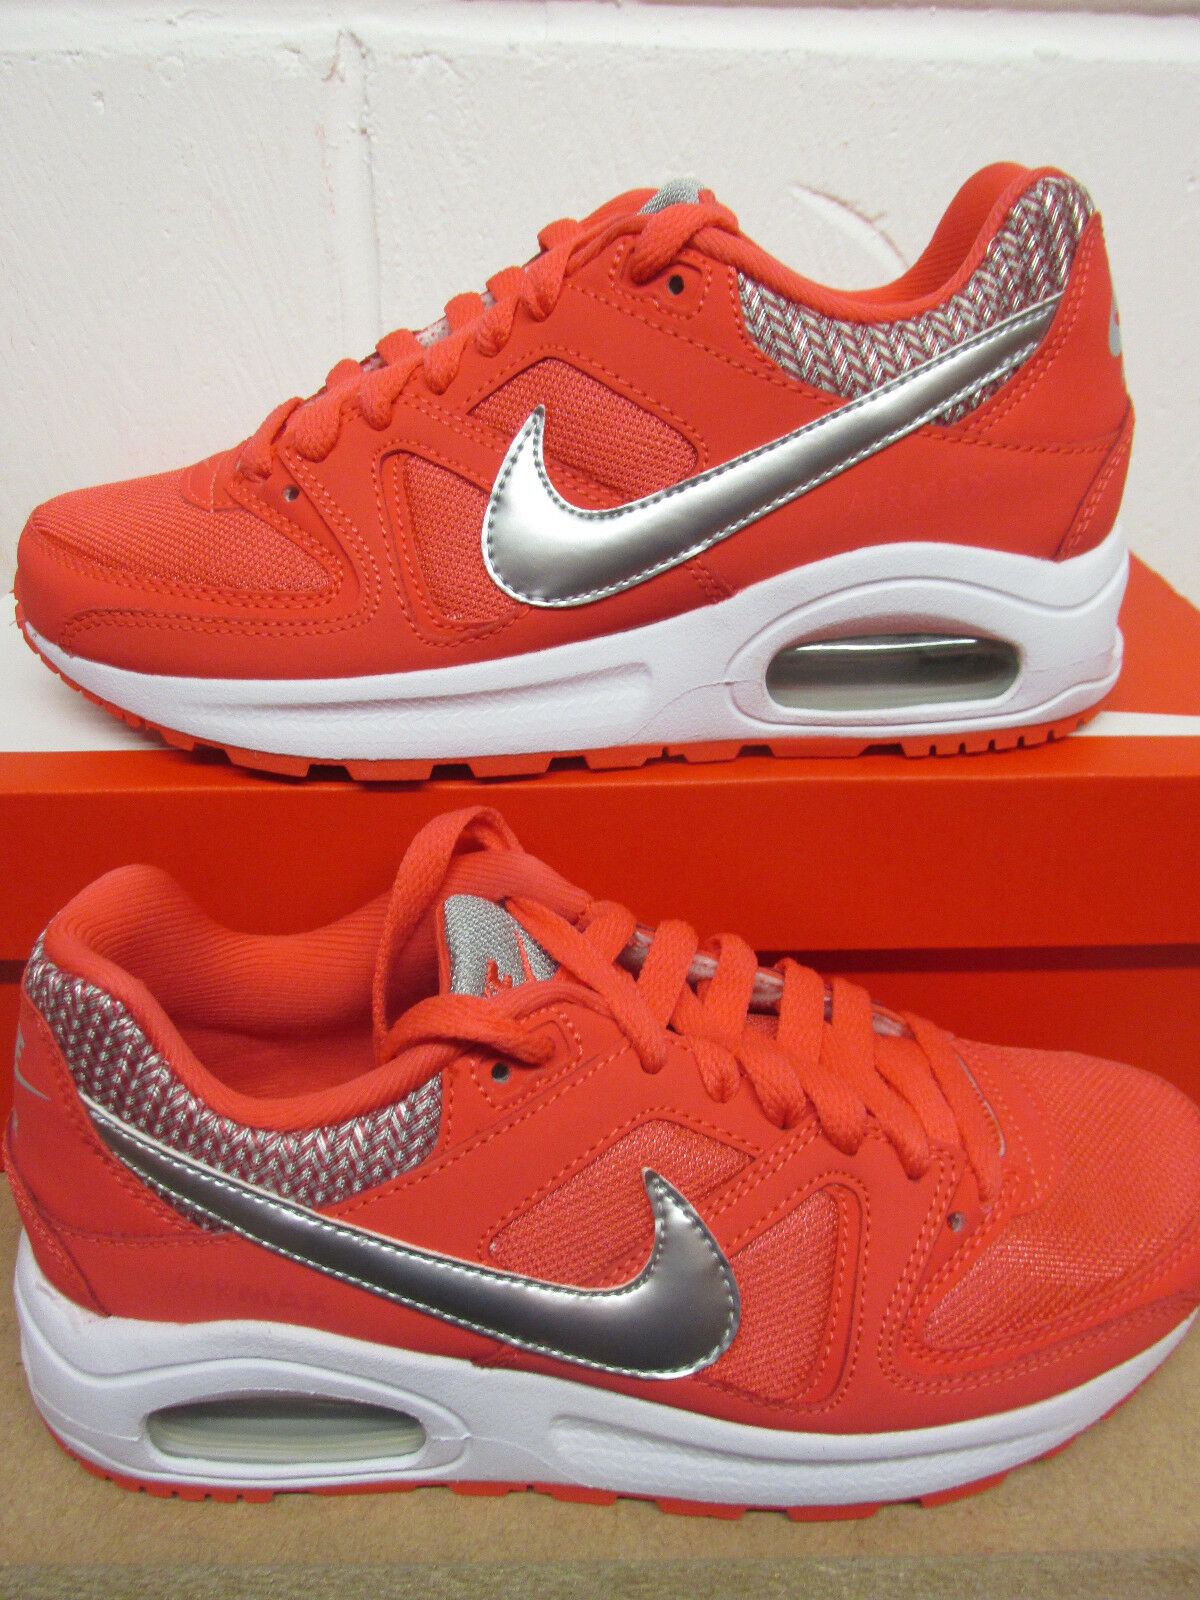 Nike (Gs) Air Max Command Flexible (Gs) Nike Basket Course 844349 801 Baskets 7efddd